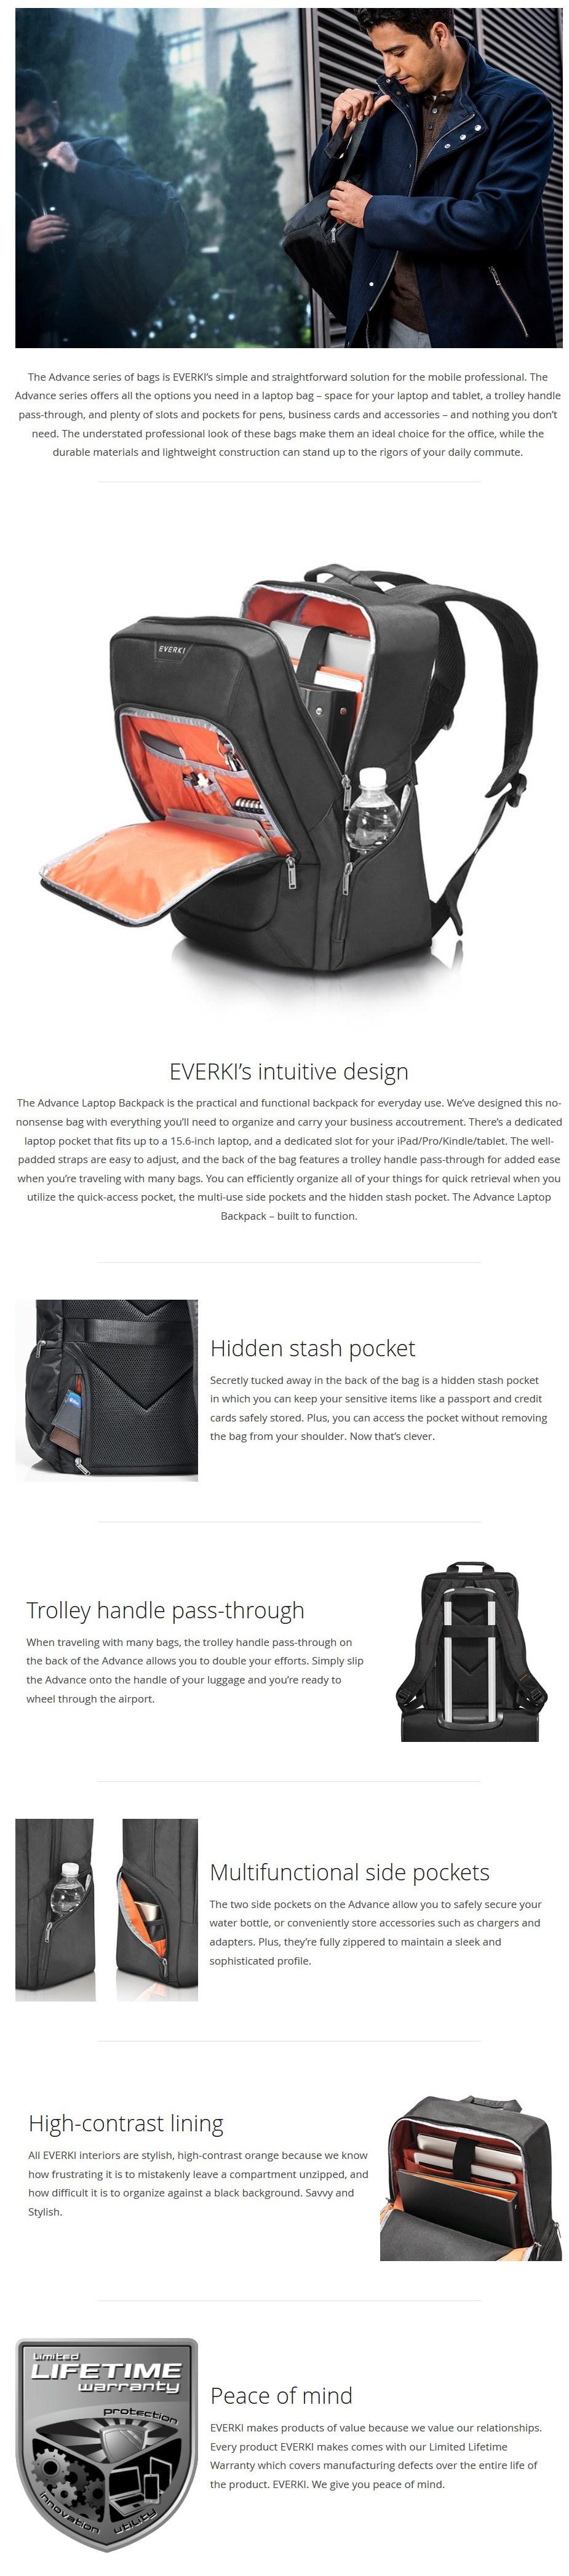 "Everki 15.6"" Advance Laptop Backpack - Desktop Overview 1"